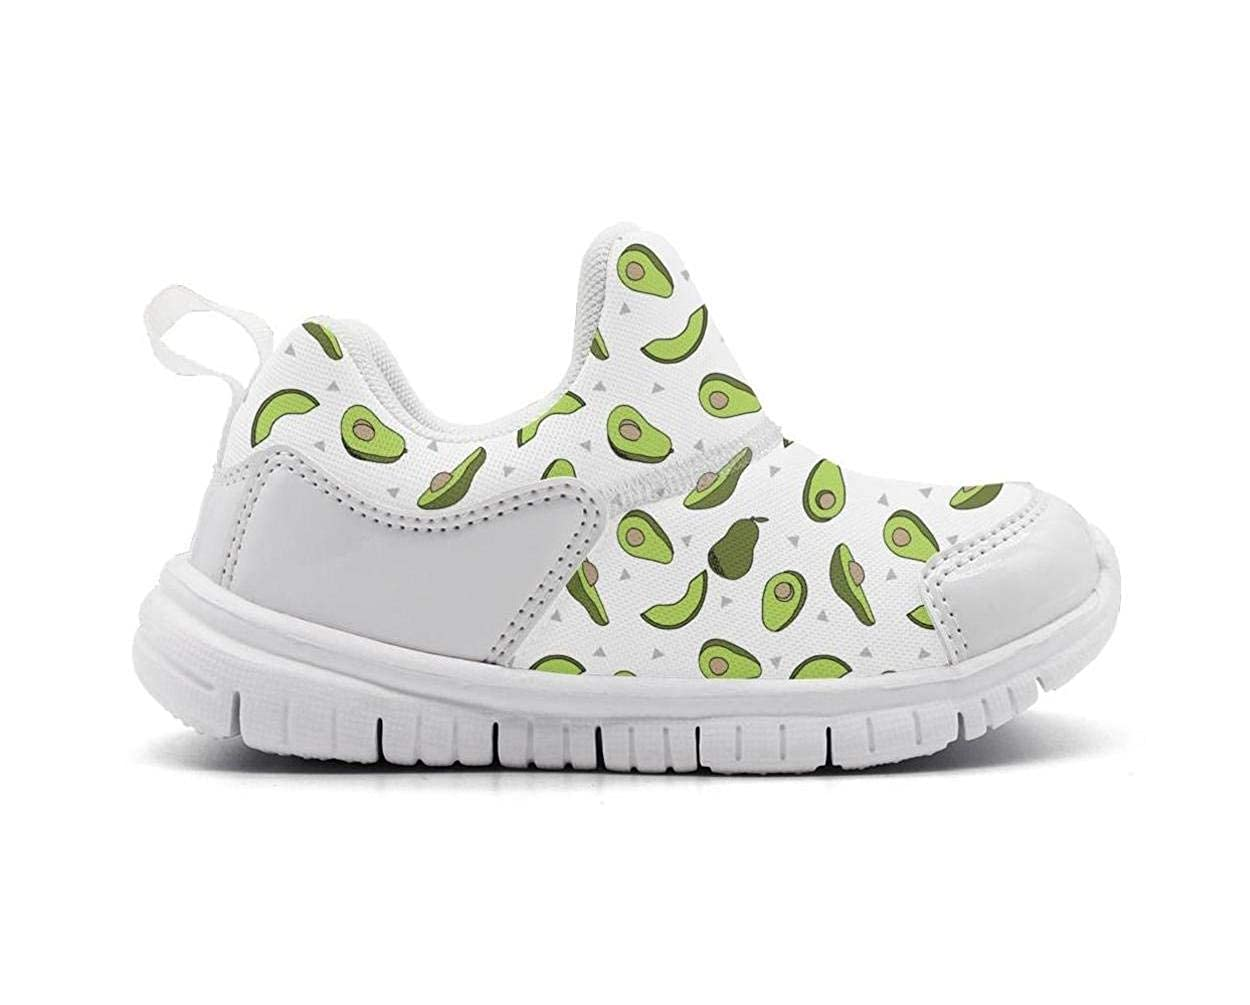 Kids Avocado Minimal Cute Fruit Fashion Lightweight Mesh Athletic Running Shoes